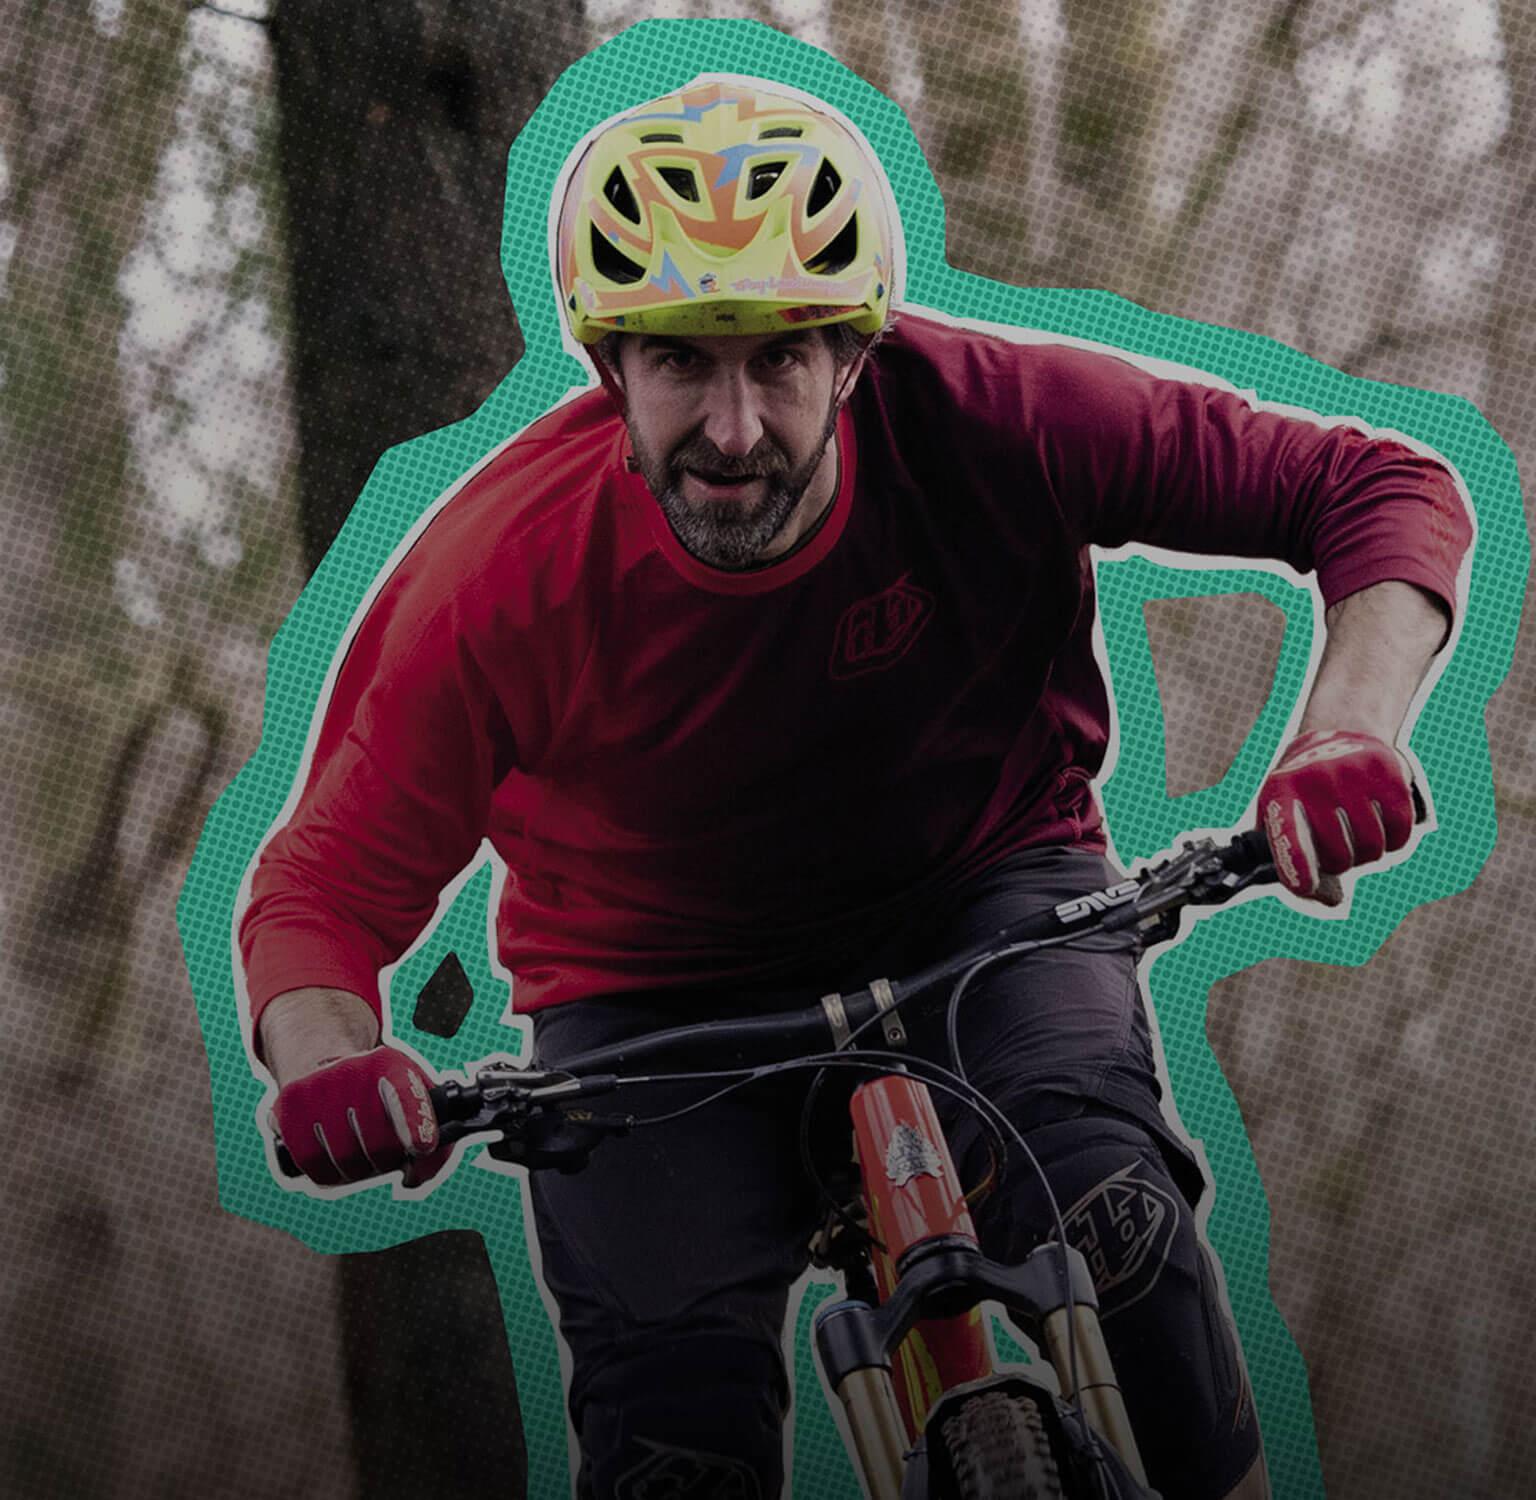 Bike Insurance Home DE tablet